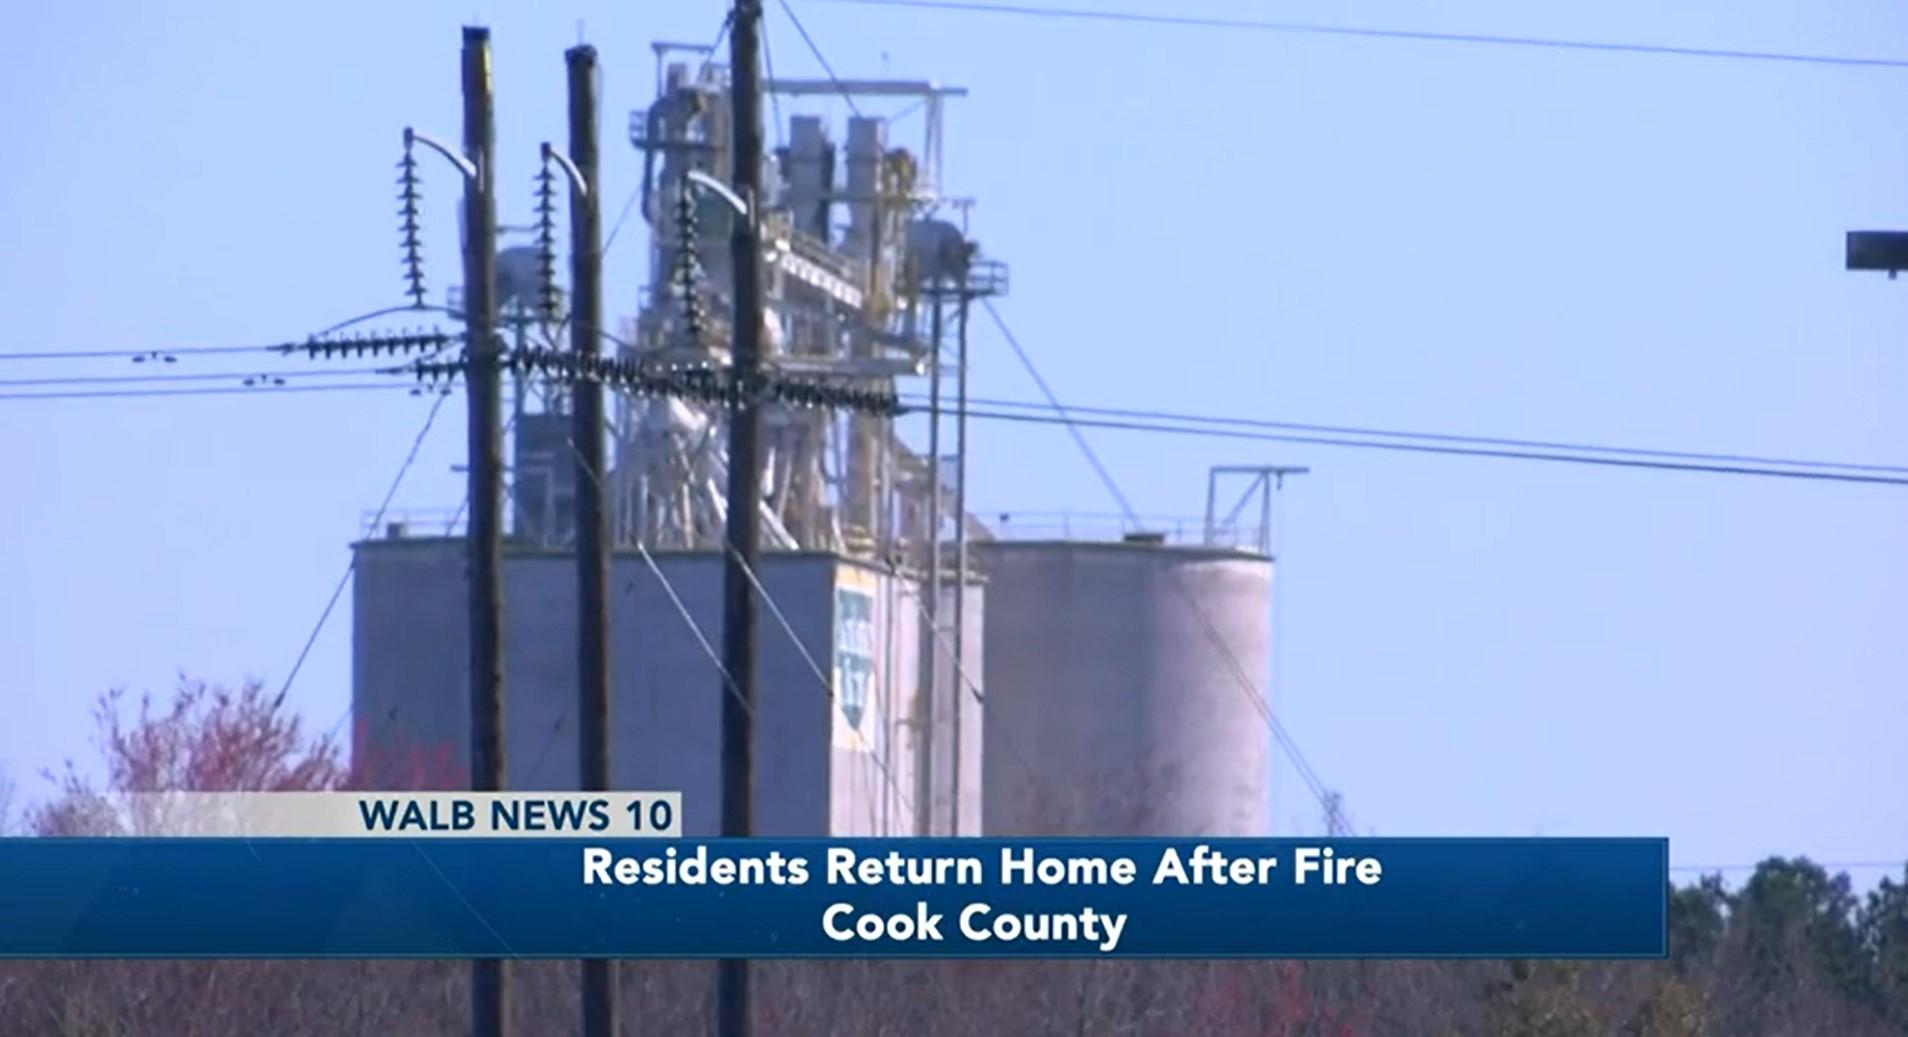 Evacuation Requested During Grain Silo Fire in Georgia